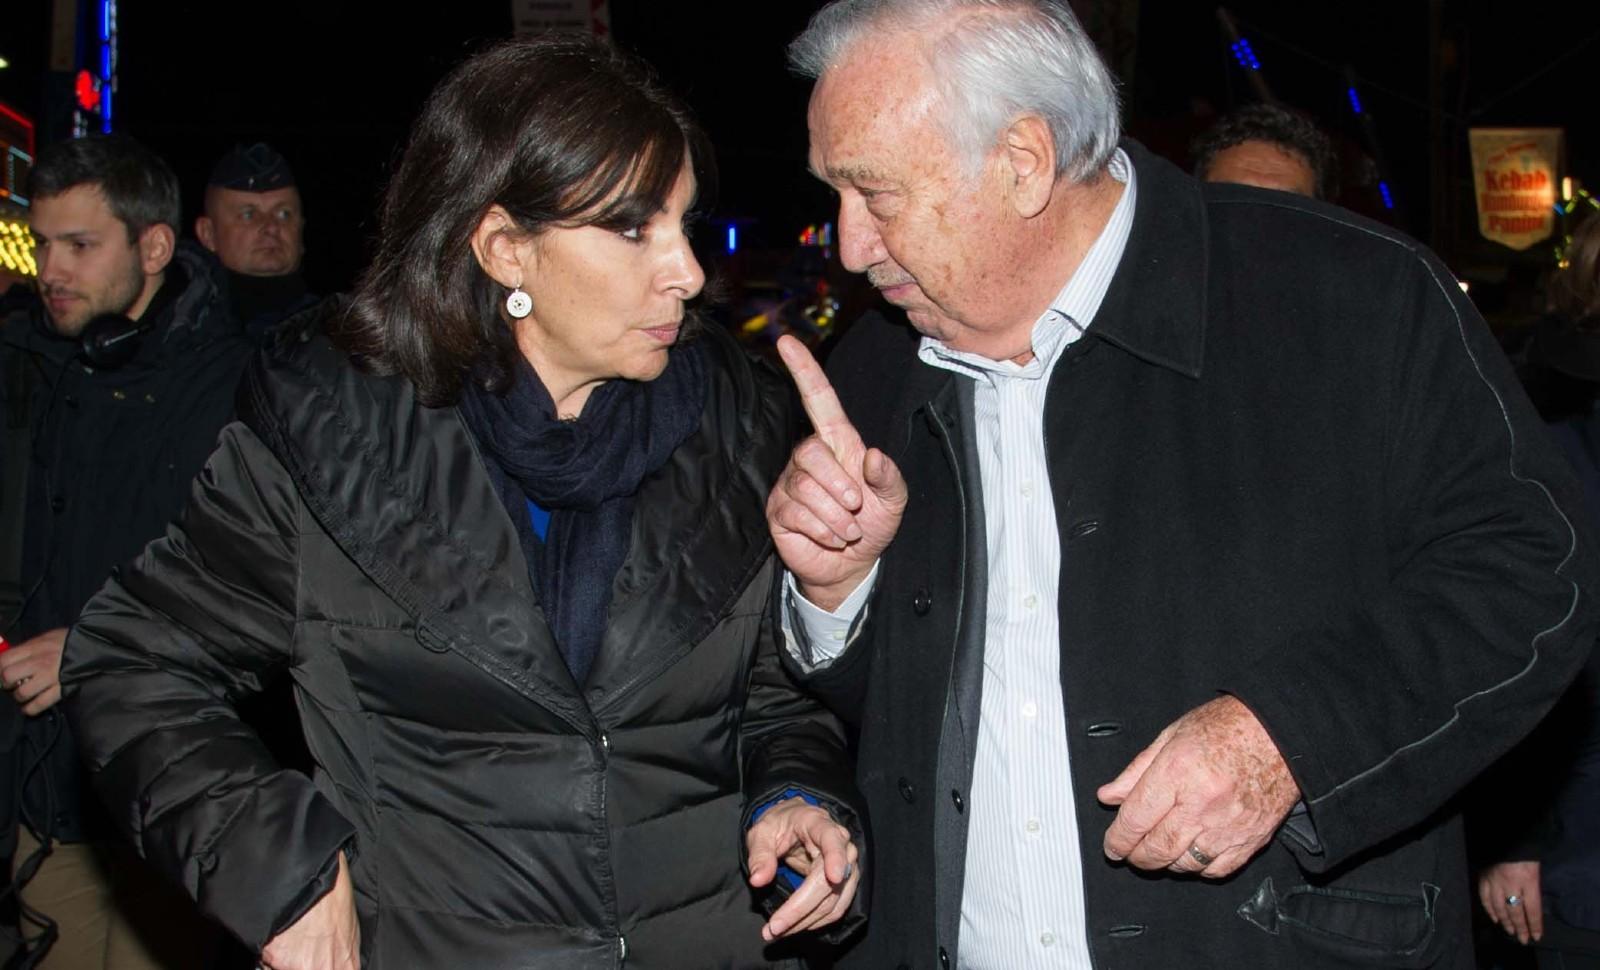 Anne Hidalgo et Marcel Campion, en 2016 © COLLOT HENRI/SIPA Numéro de reportage  : 00748607_000005